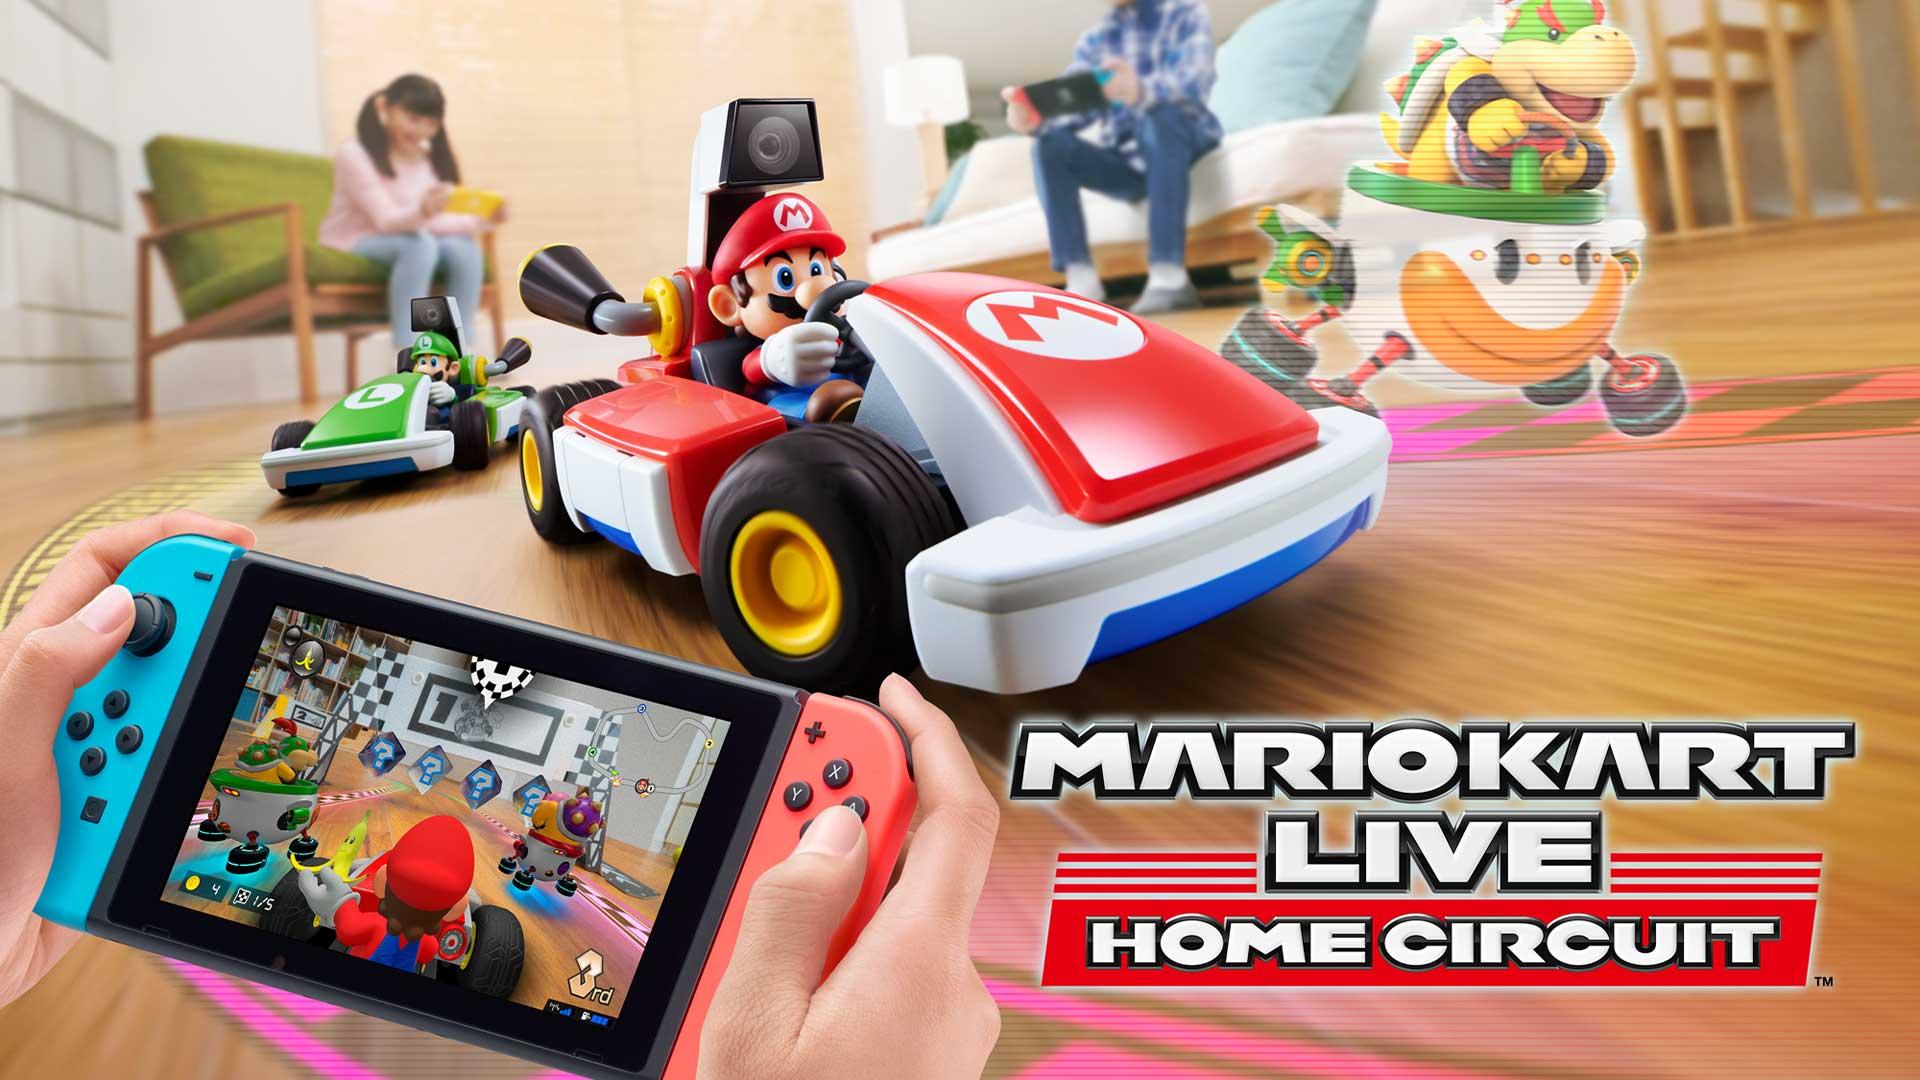 mario kart live home circuit cover